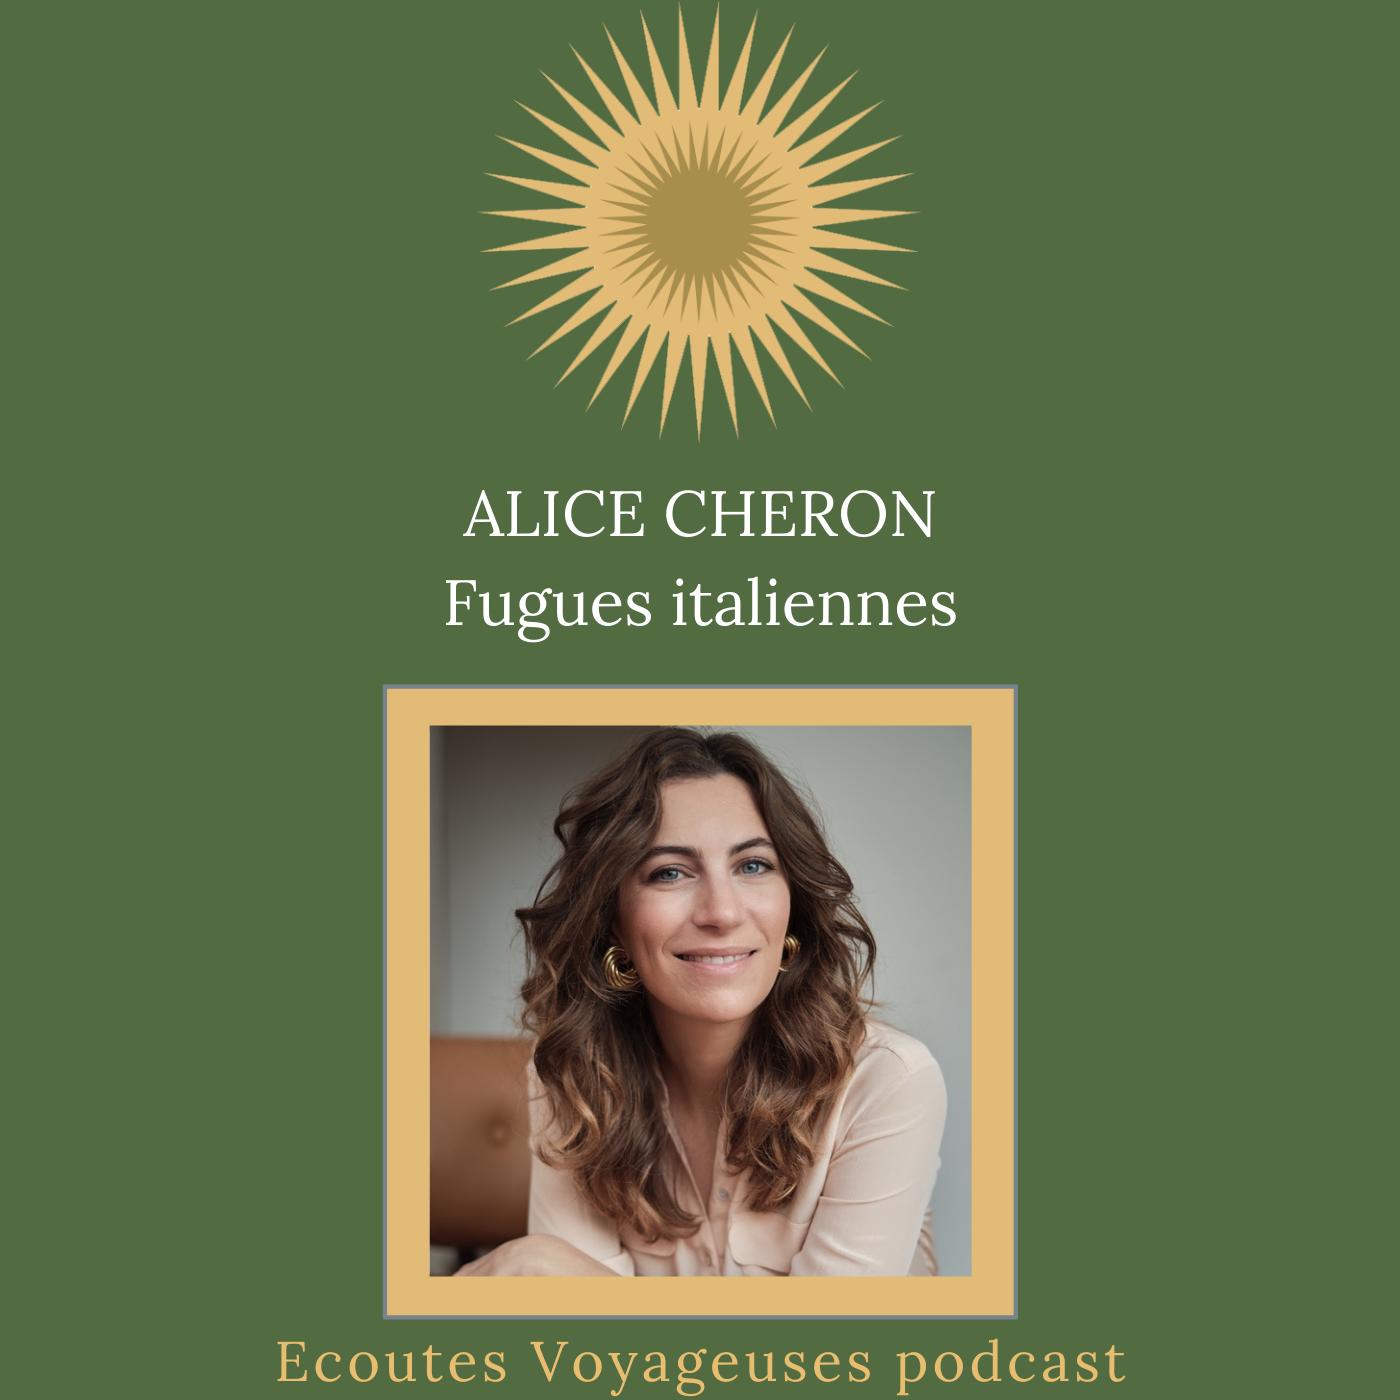 Fugues italiennes avec Alice Cheron